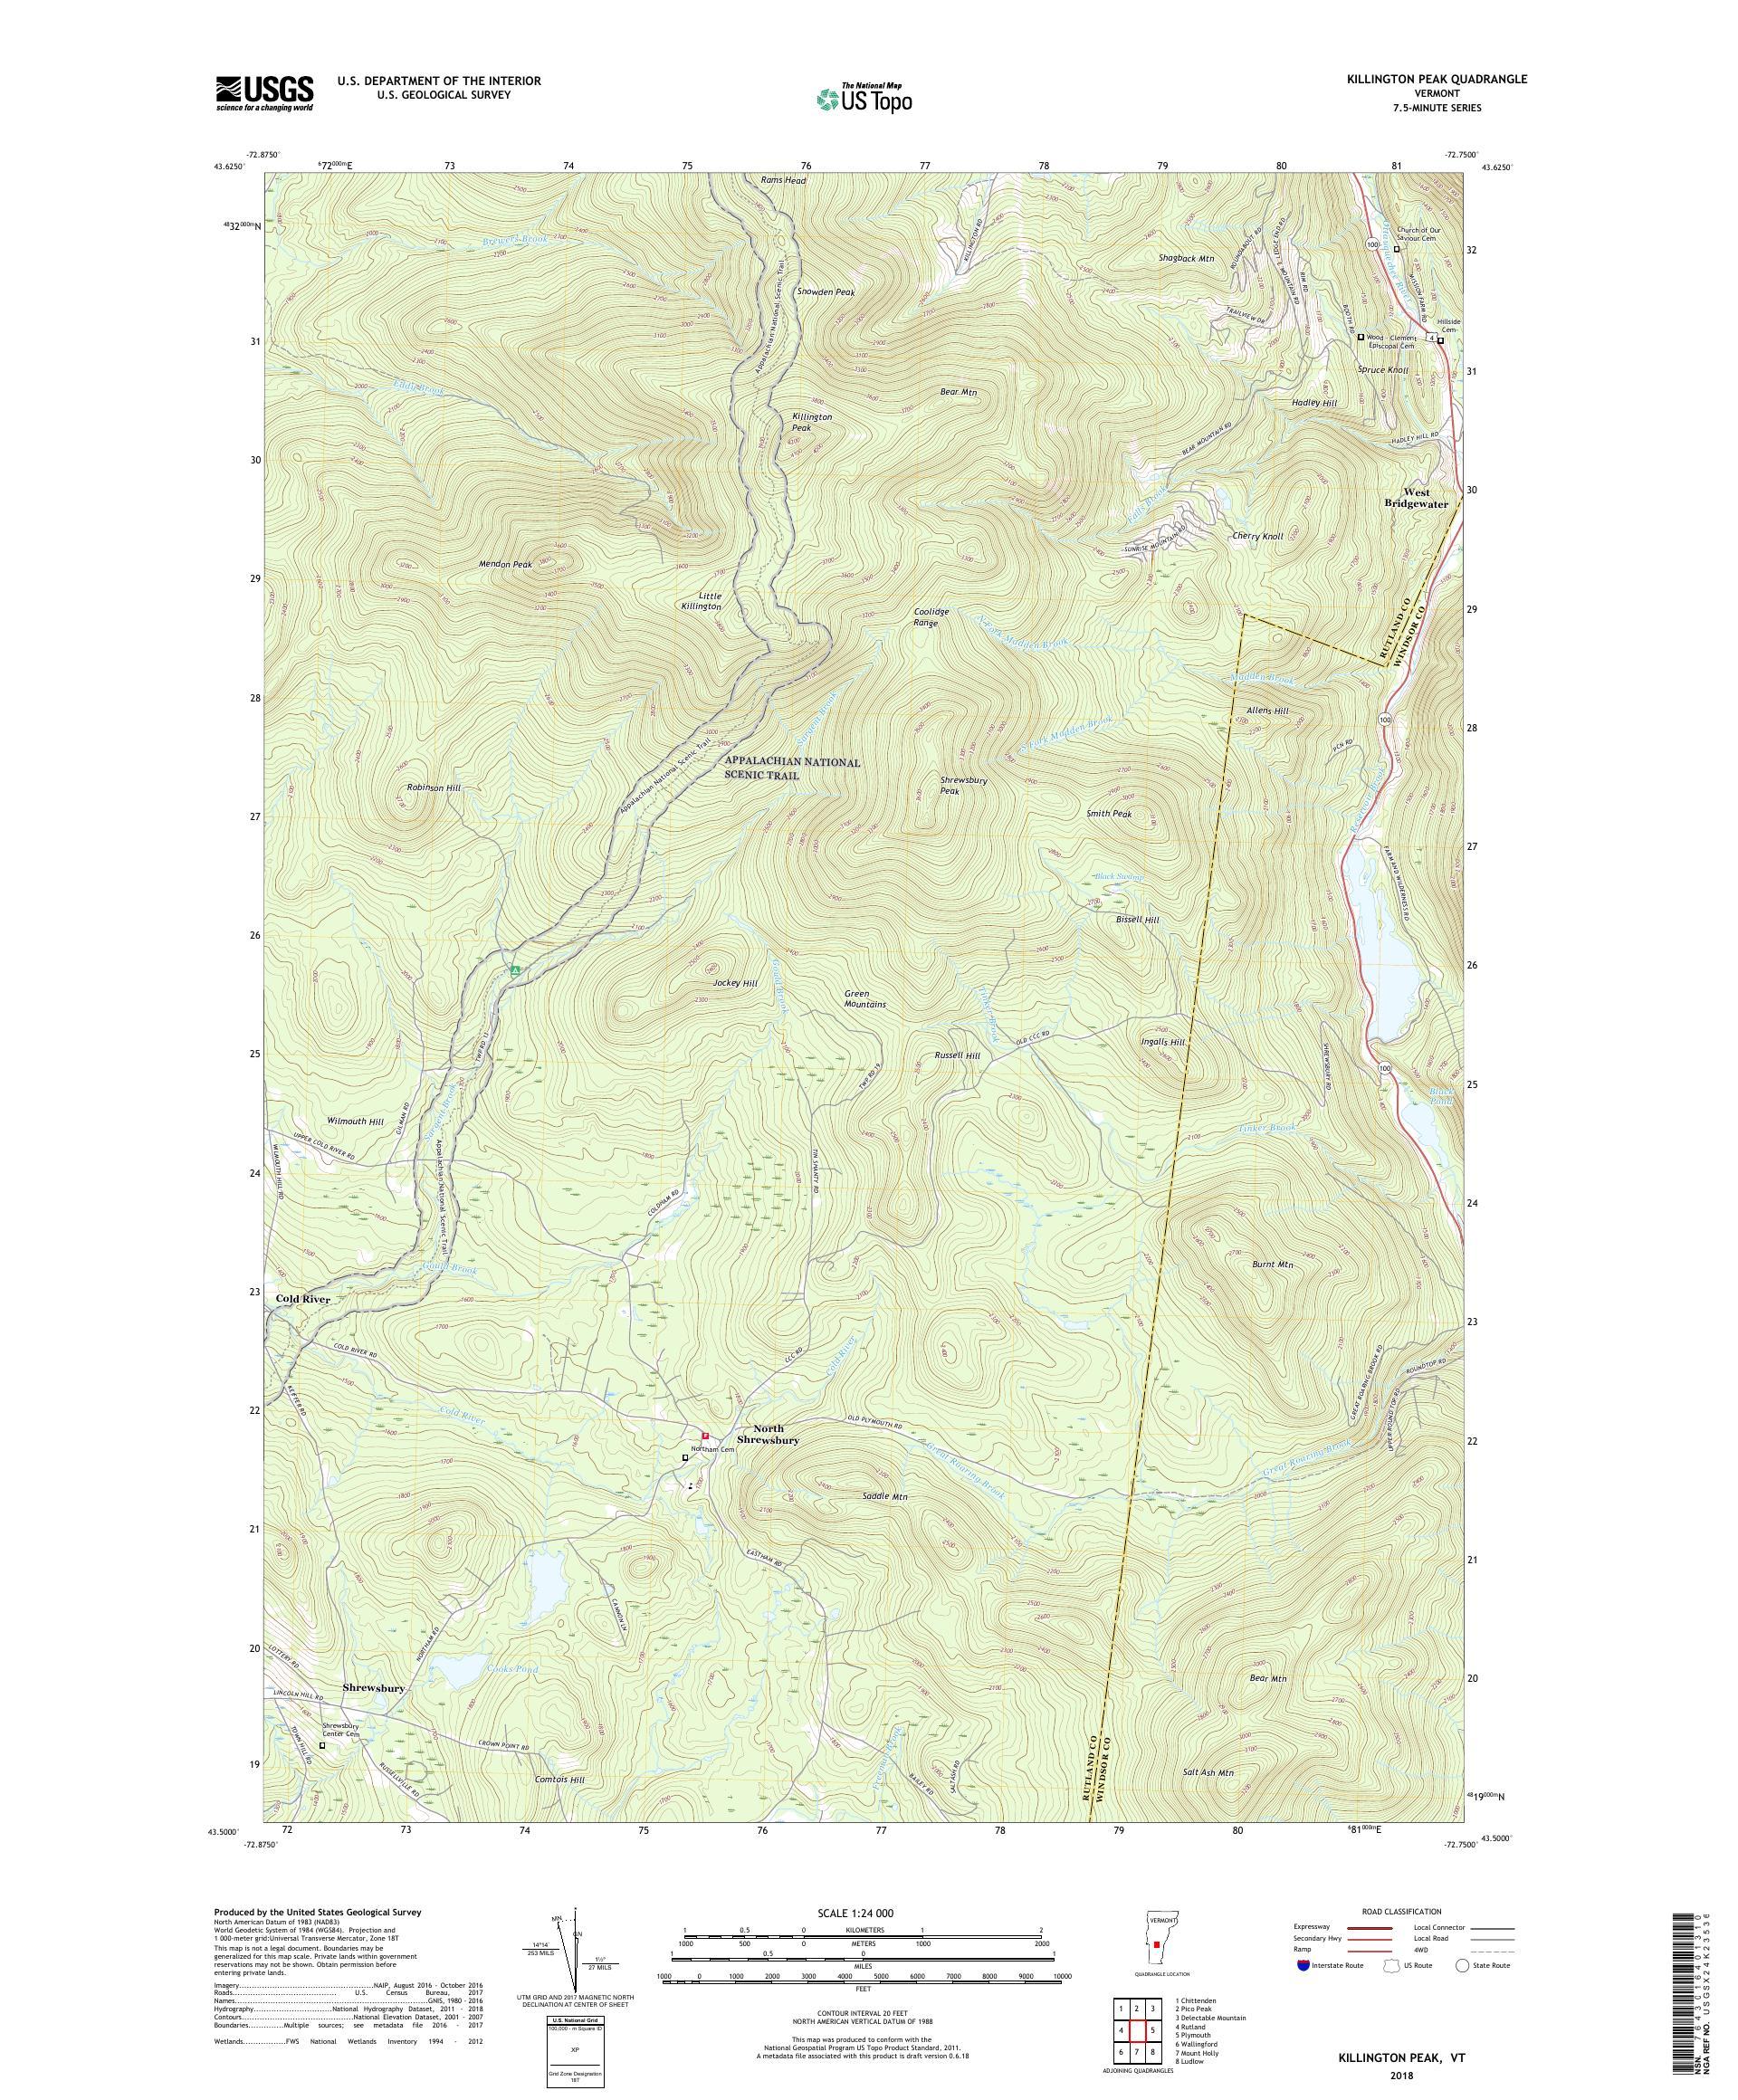 MyTopo Killington Peak, Vermont USGS Quad Topo Map on burlington vt map, glastenbury vt map, jacksonville vt map, danby vt map, west dover vt map, sutton vt map, north ferrisburgh vt map, saxtons river vt map, green mountains vt map, rutland vermont map, averill vt map, hiking long trail vt map, berkshire vt map, vermont airports map, pownal vt map, castleton vt map, post mills vt map, manchester vt map, mount mansfield vt map, holland vt map,